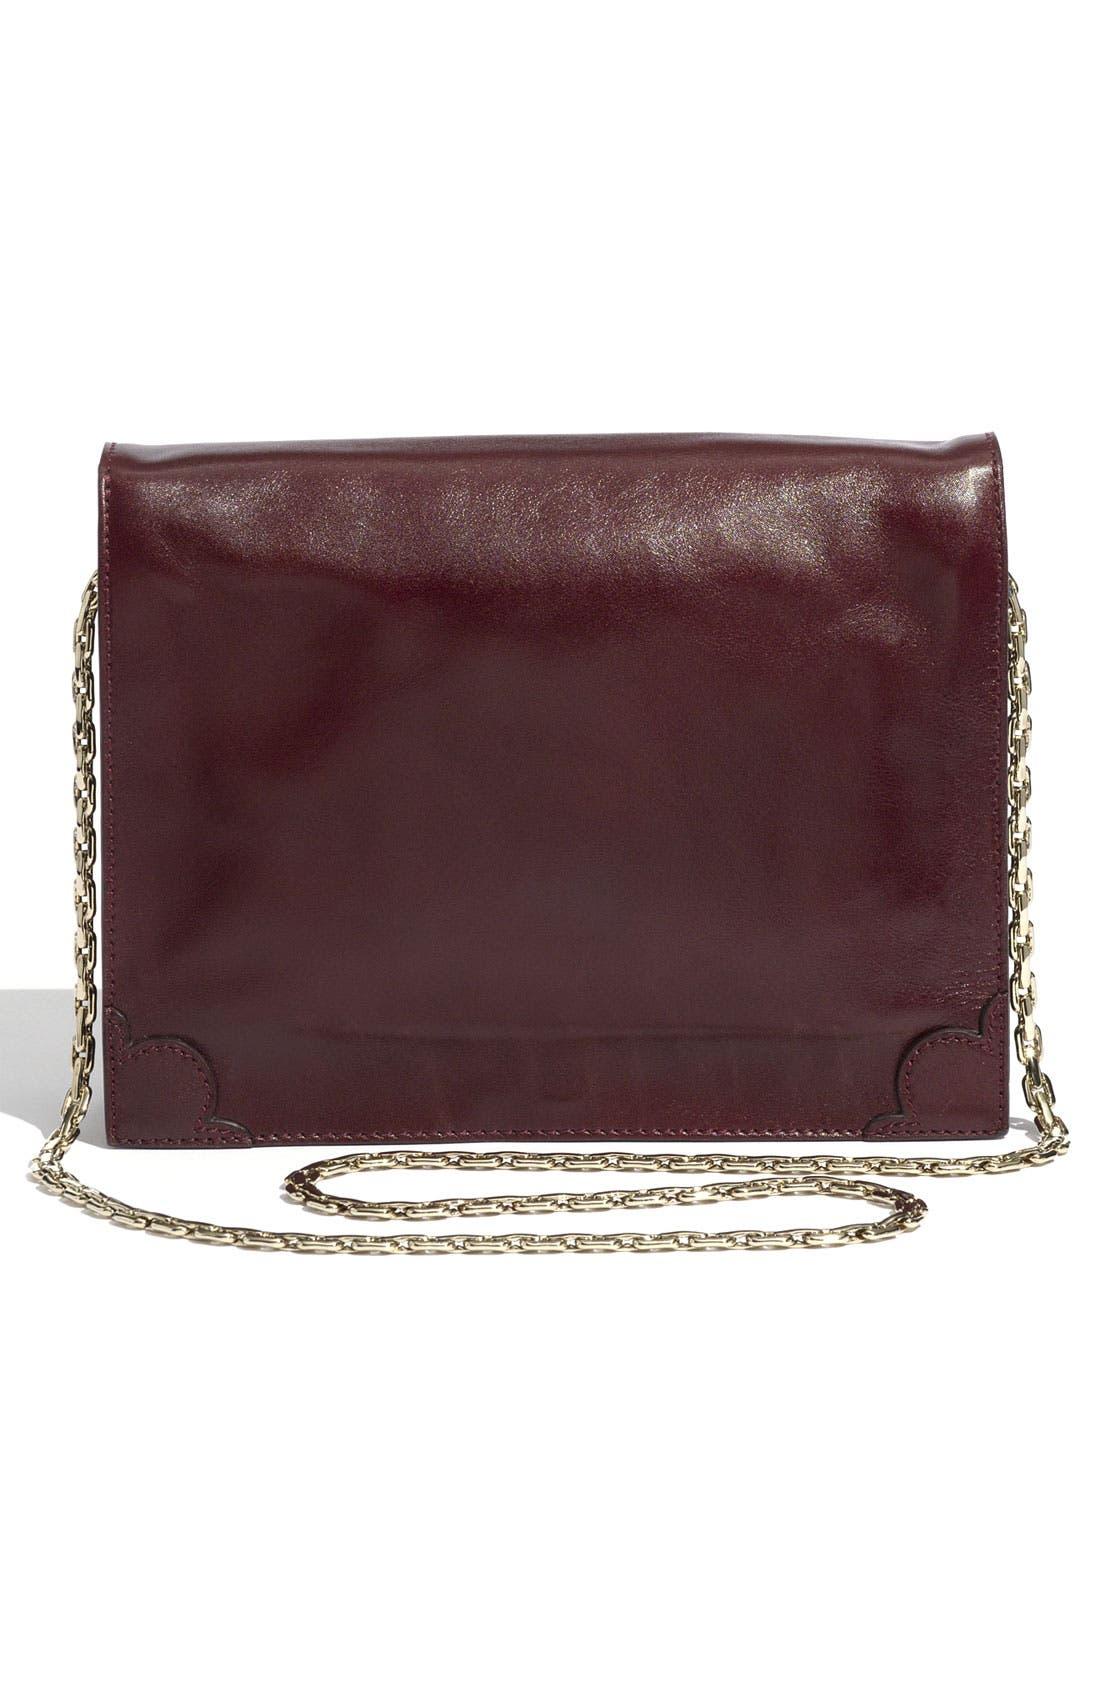 ,                             Jason Wu 'Jourdan' Calfskin Leather Shoulder Bag,                             Alternate thumbnail 6, color,                             930